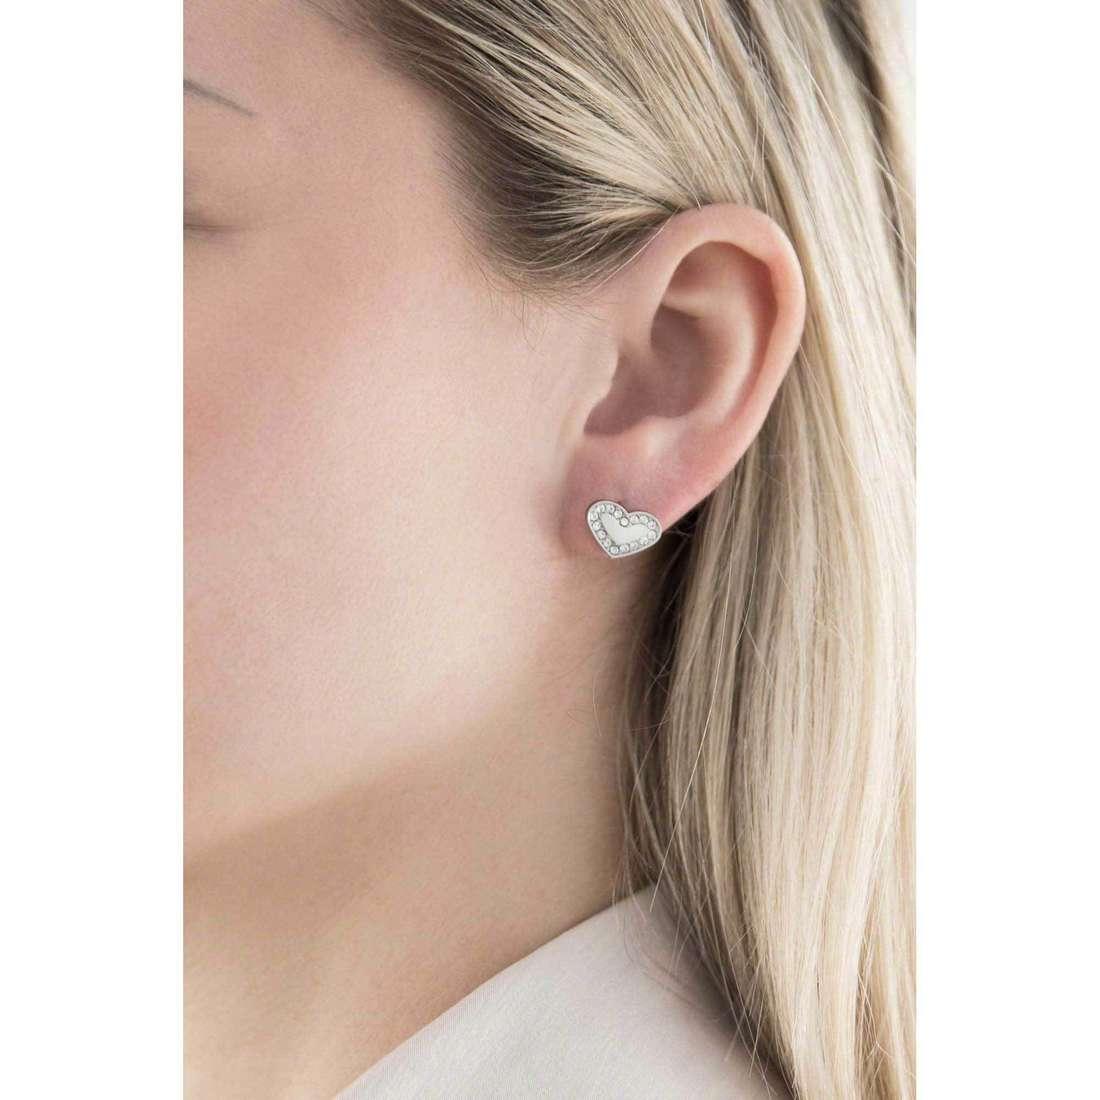 Morellato boucles d'oreille Abbraccio femme SABG07 indosso